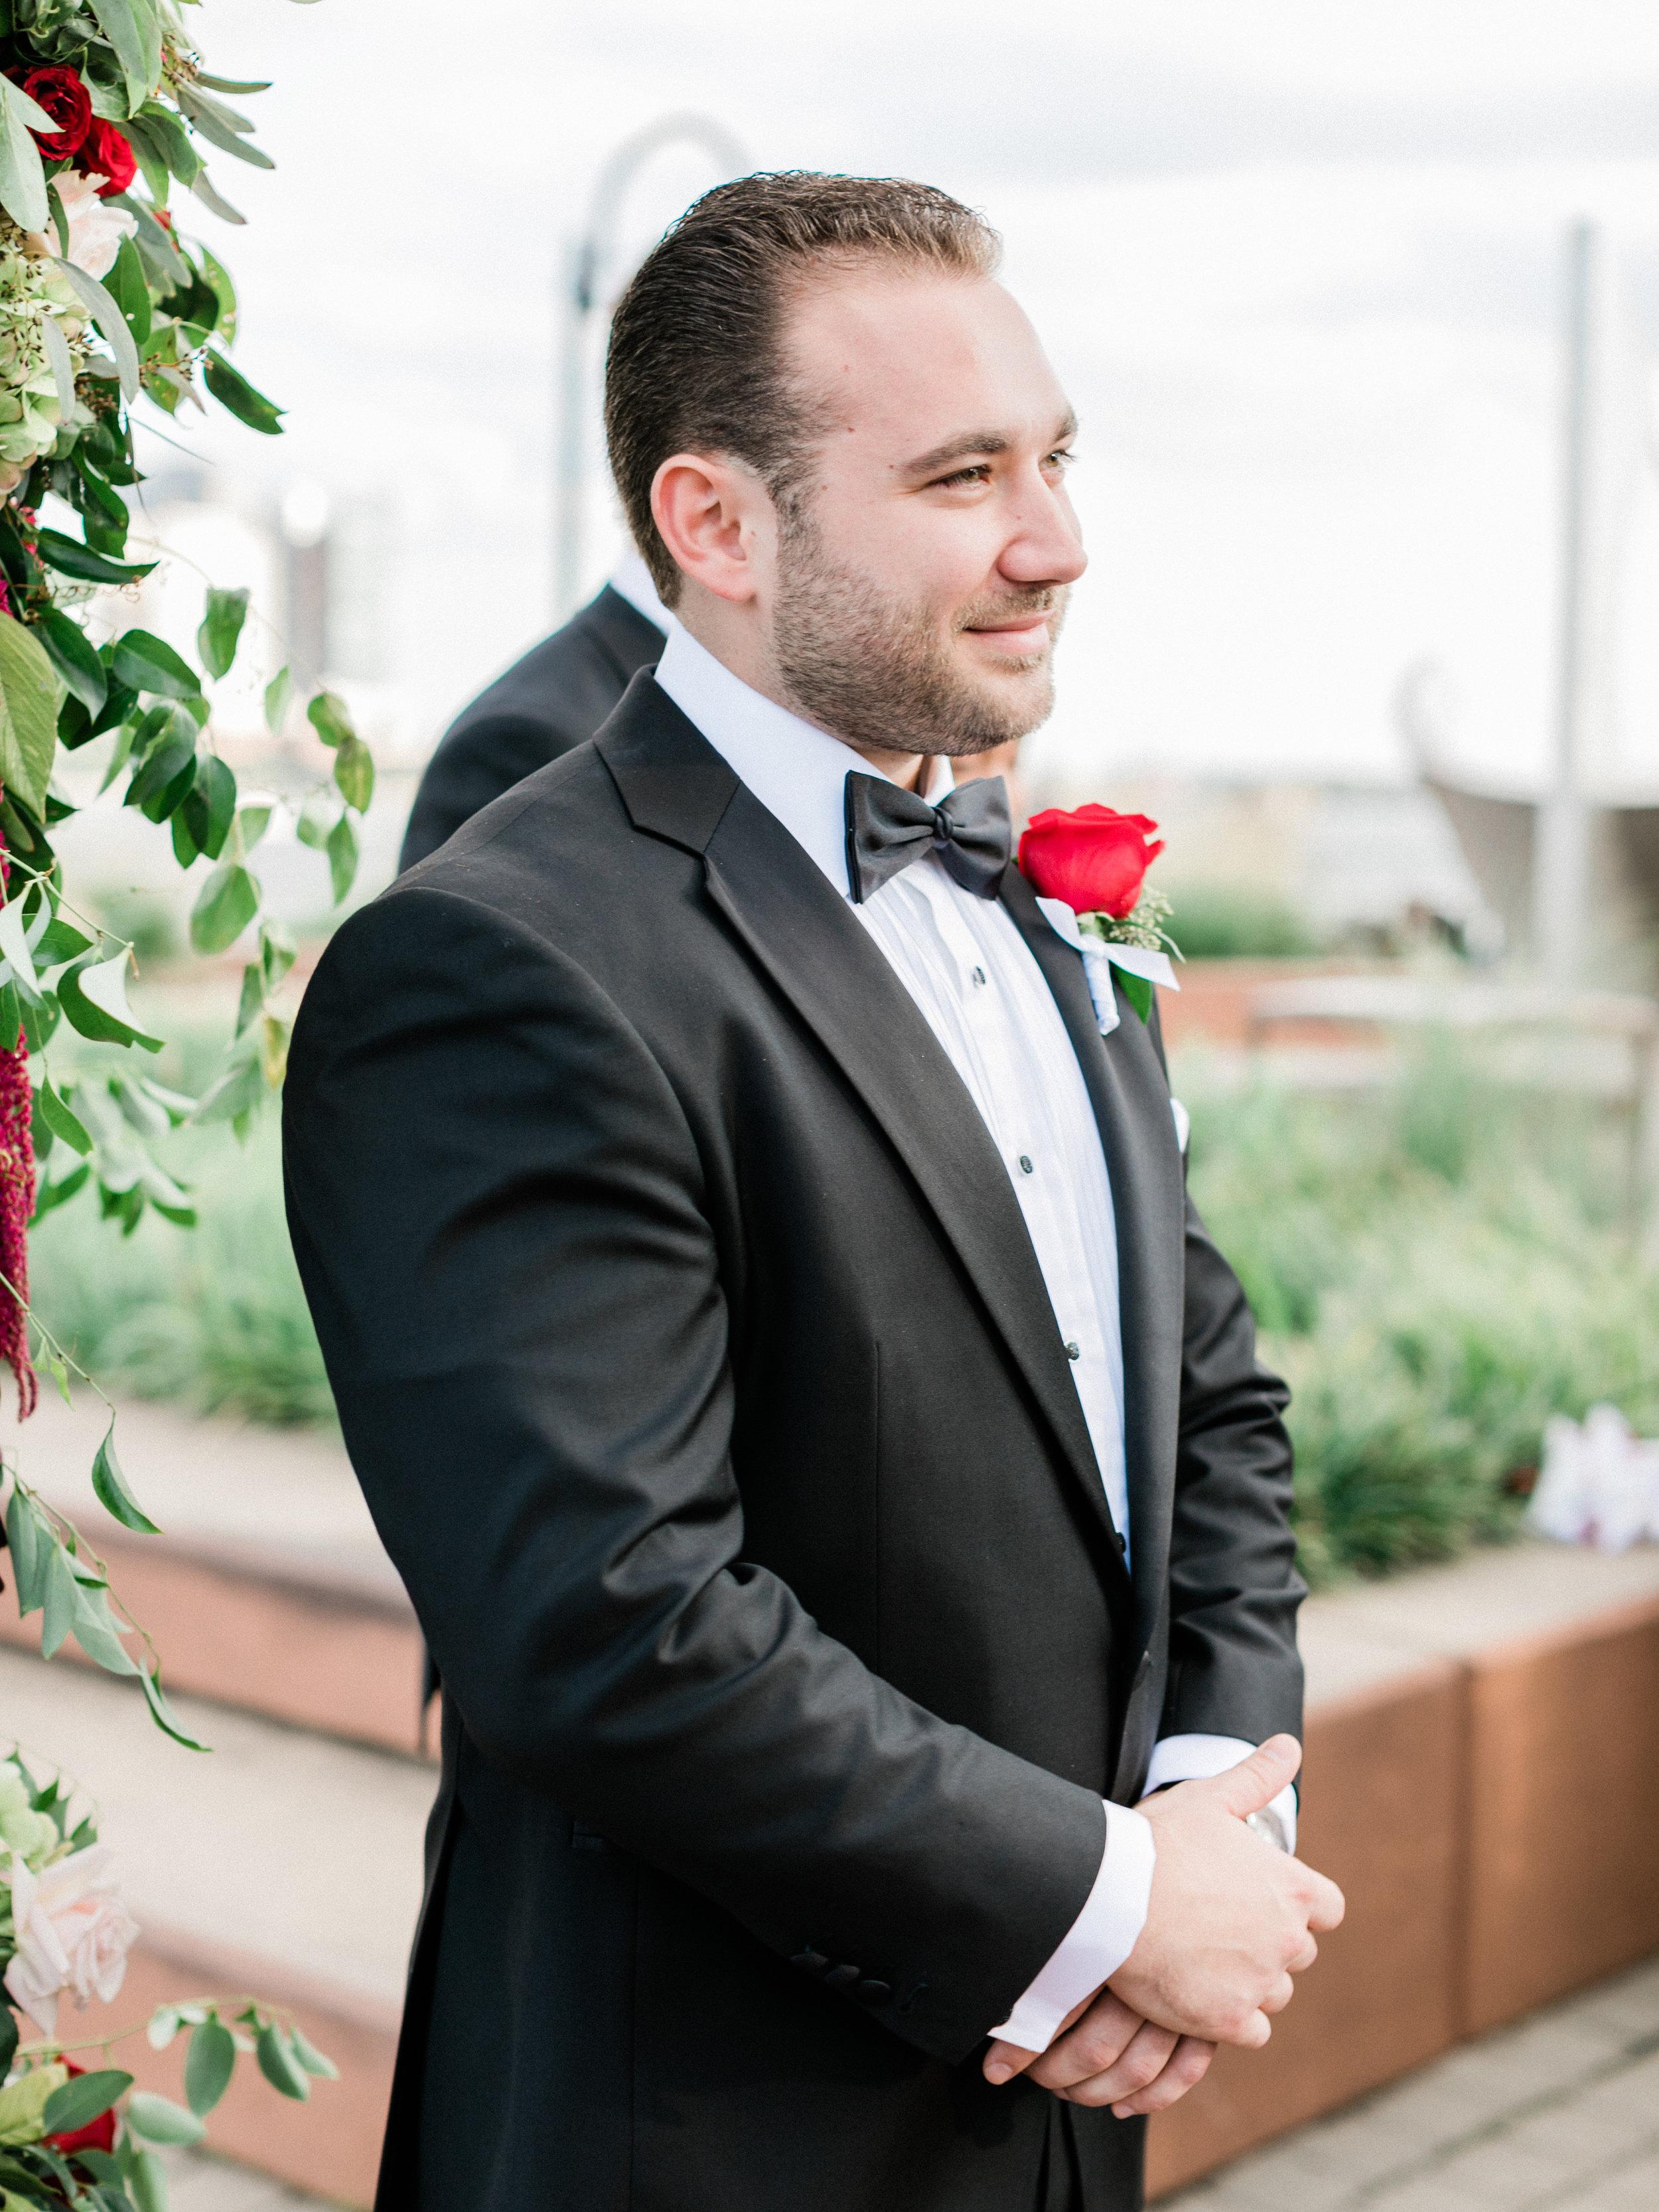 hyatt-regency-jersey-city-wedding-photographer44.jpg